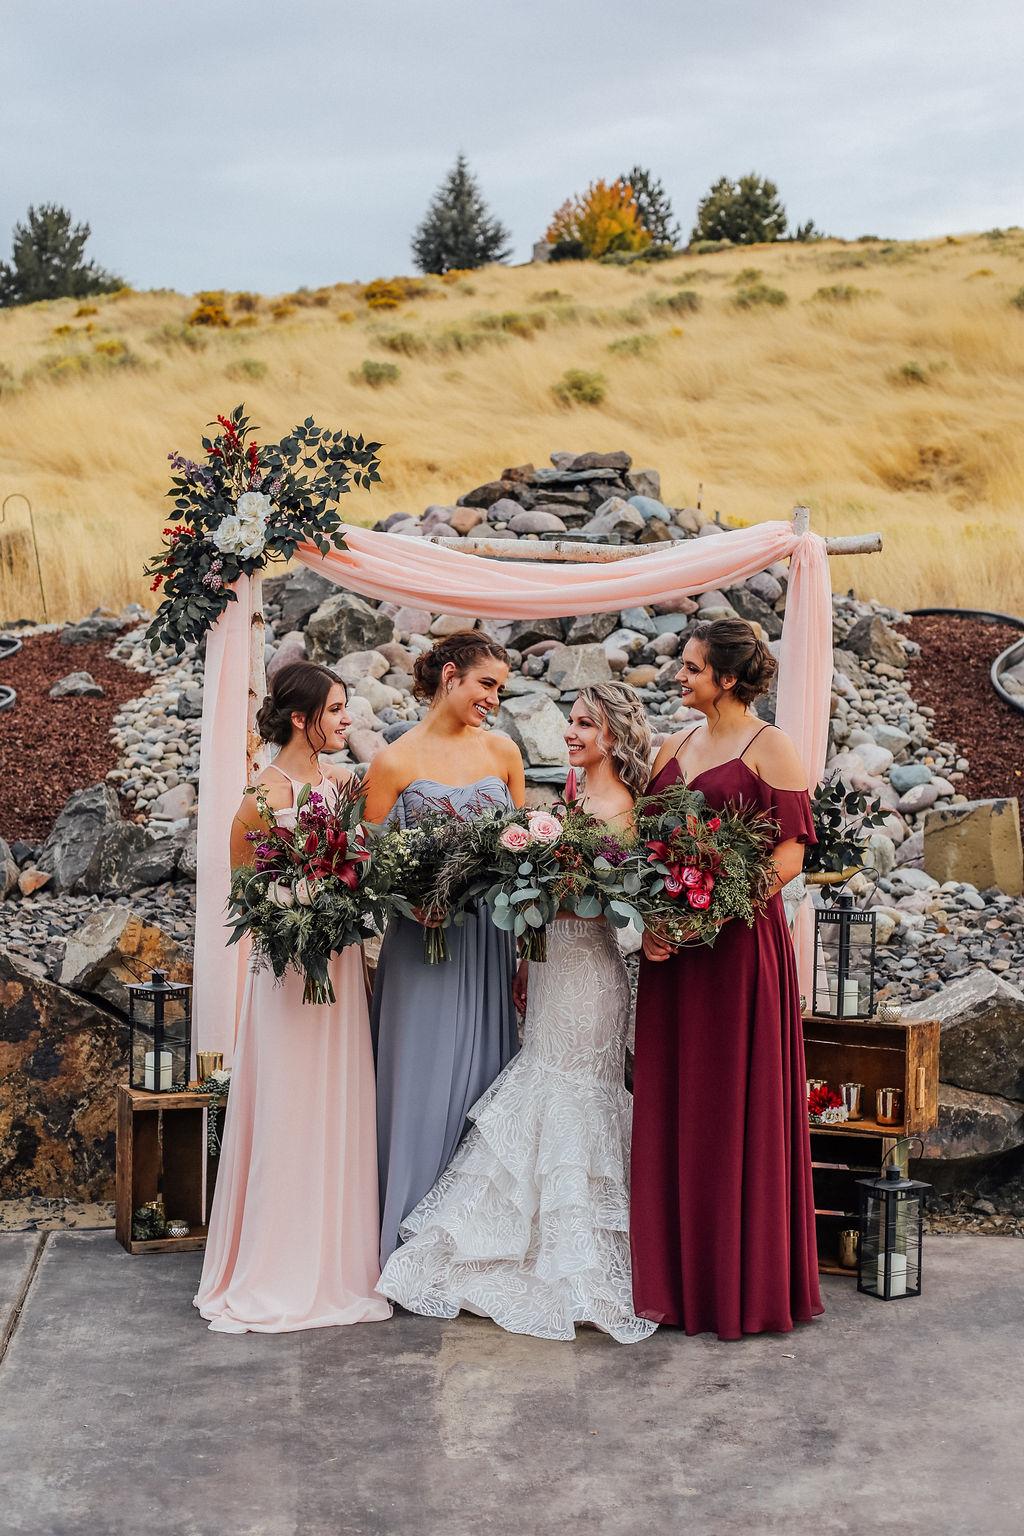 509 Bride_the 509 bride_purple pineapple photography_1